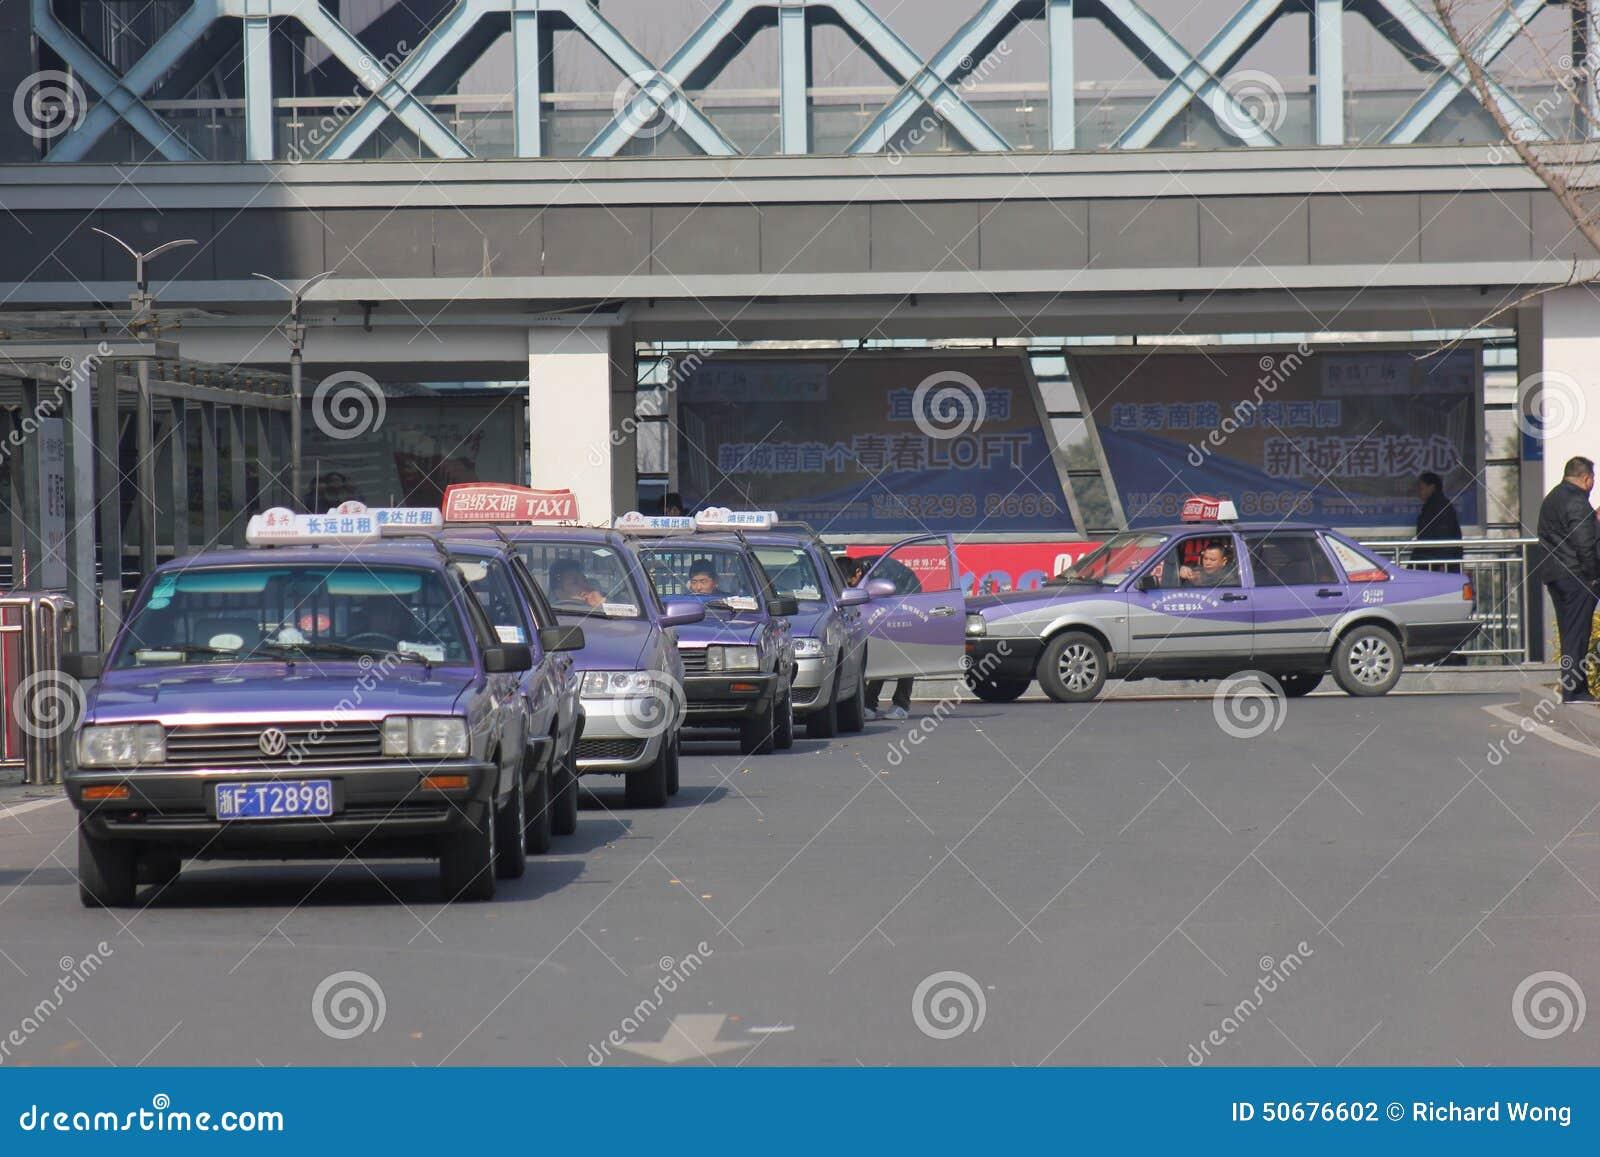 Download 等待的出租汽车 图库摄影片. 图片 包括有 紫色, 自动, 颜色, 客户机, 公共汽车, 晴朗, 竞争, 等待 - 50676602